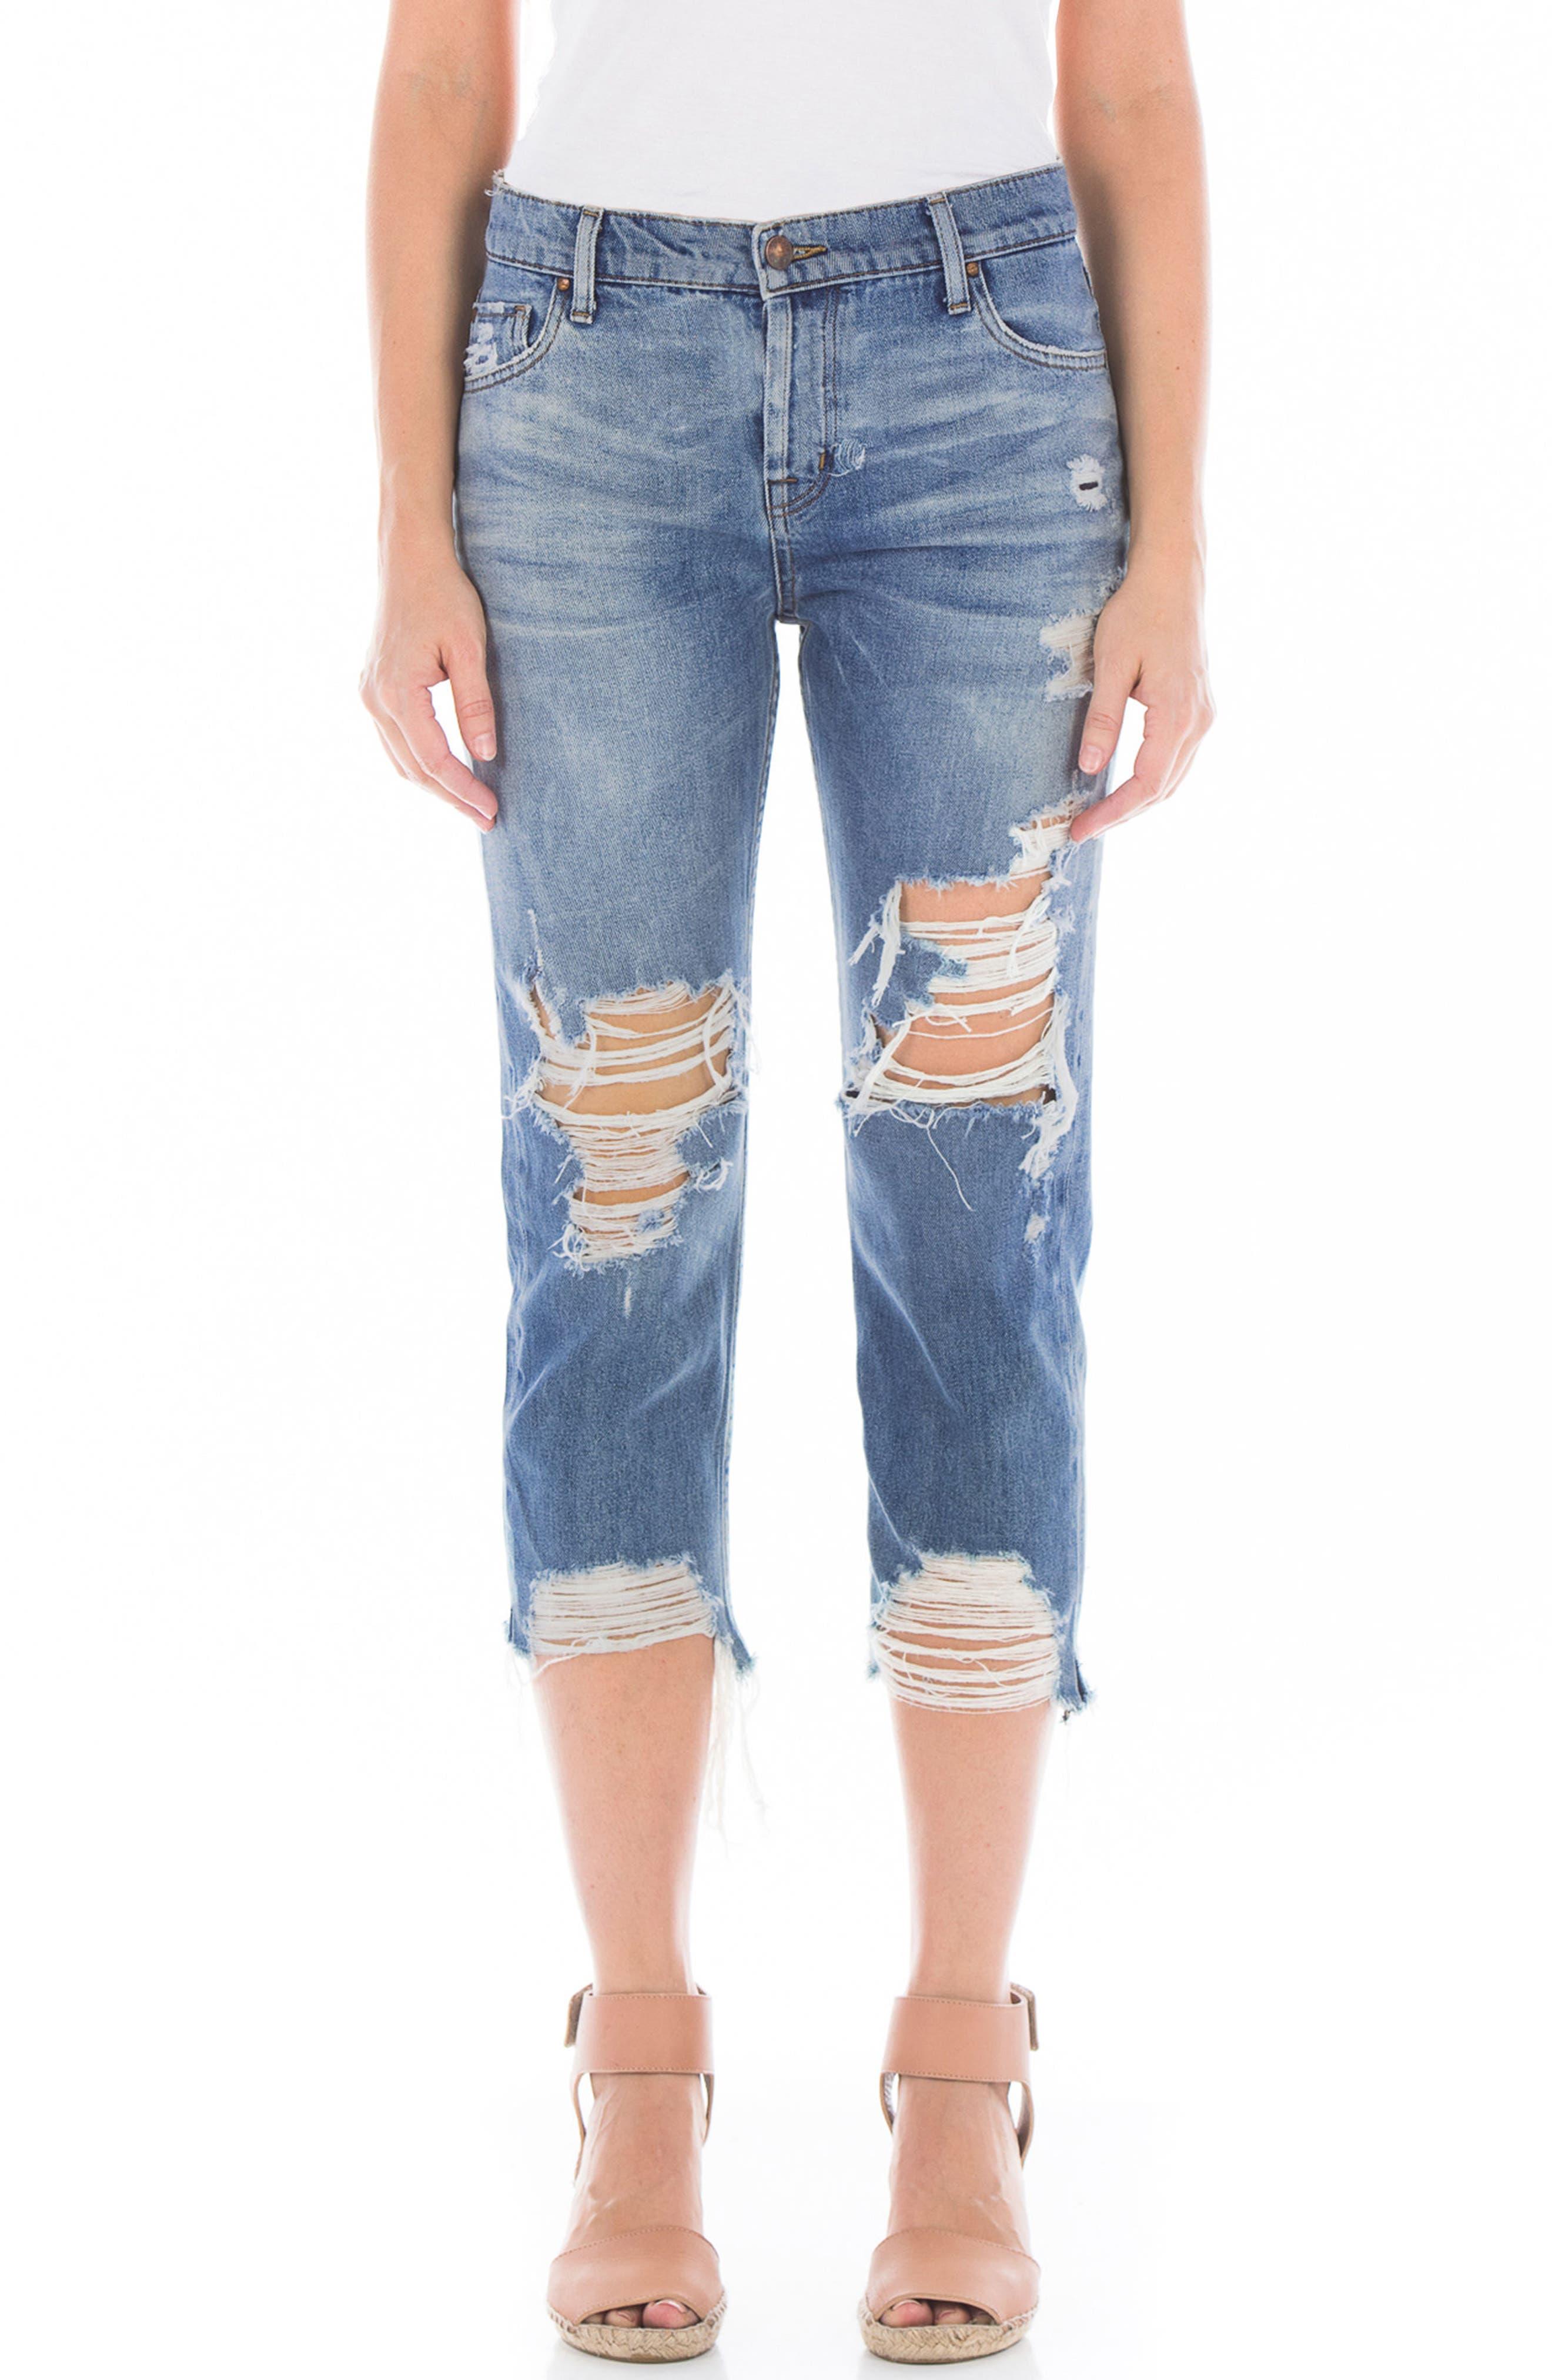 Image of FIDELITY DENIM Dee Dee Distressed Shredded Cropped Jeans